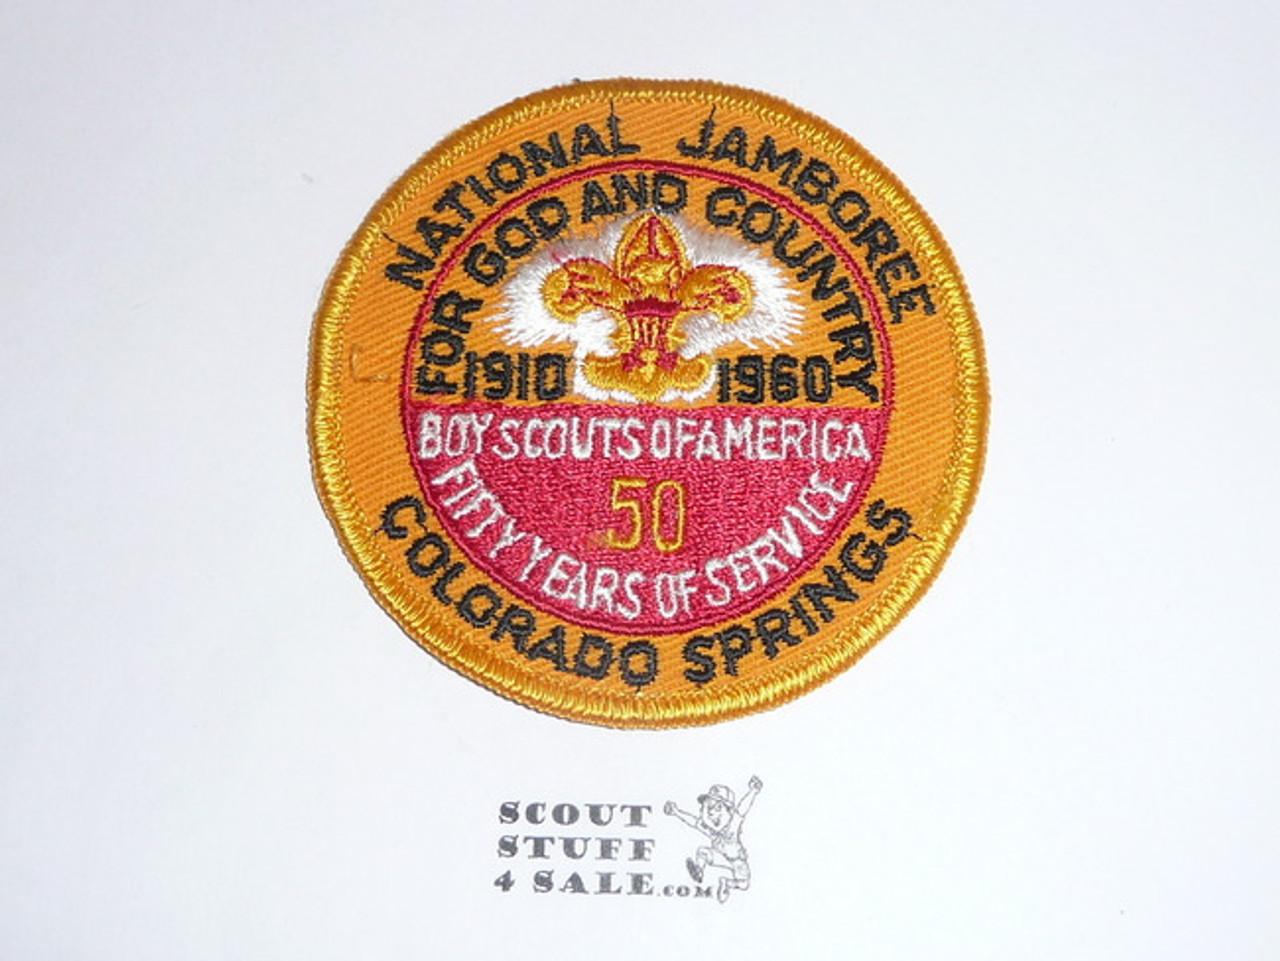 1960 National Jamboree Patch